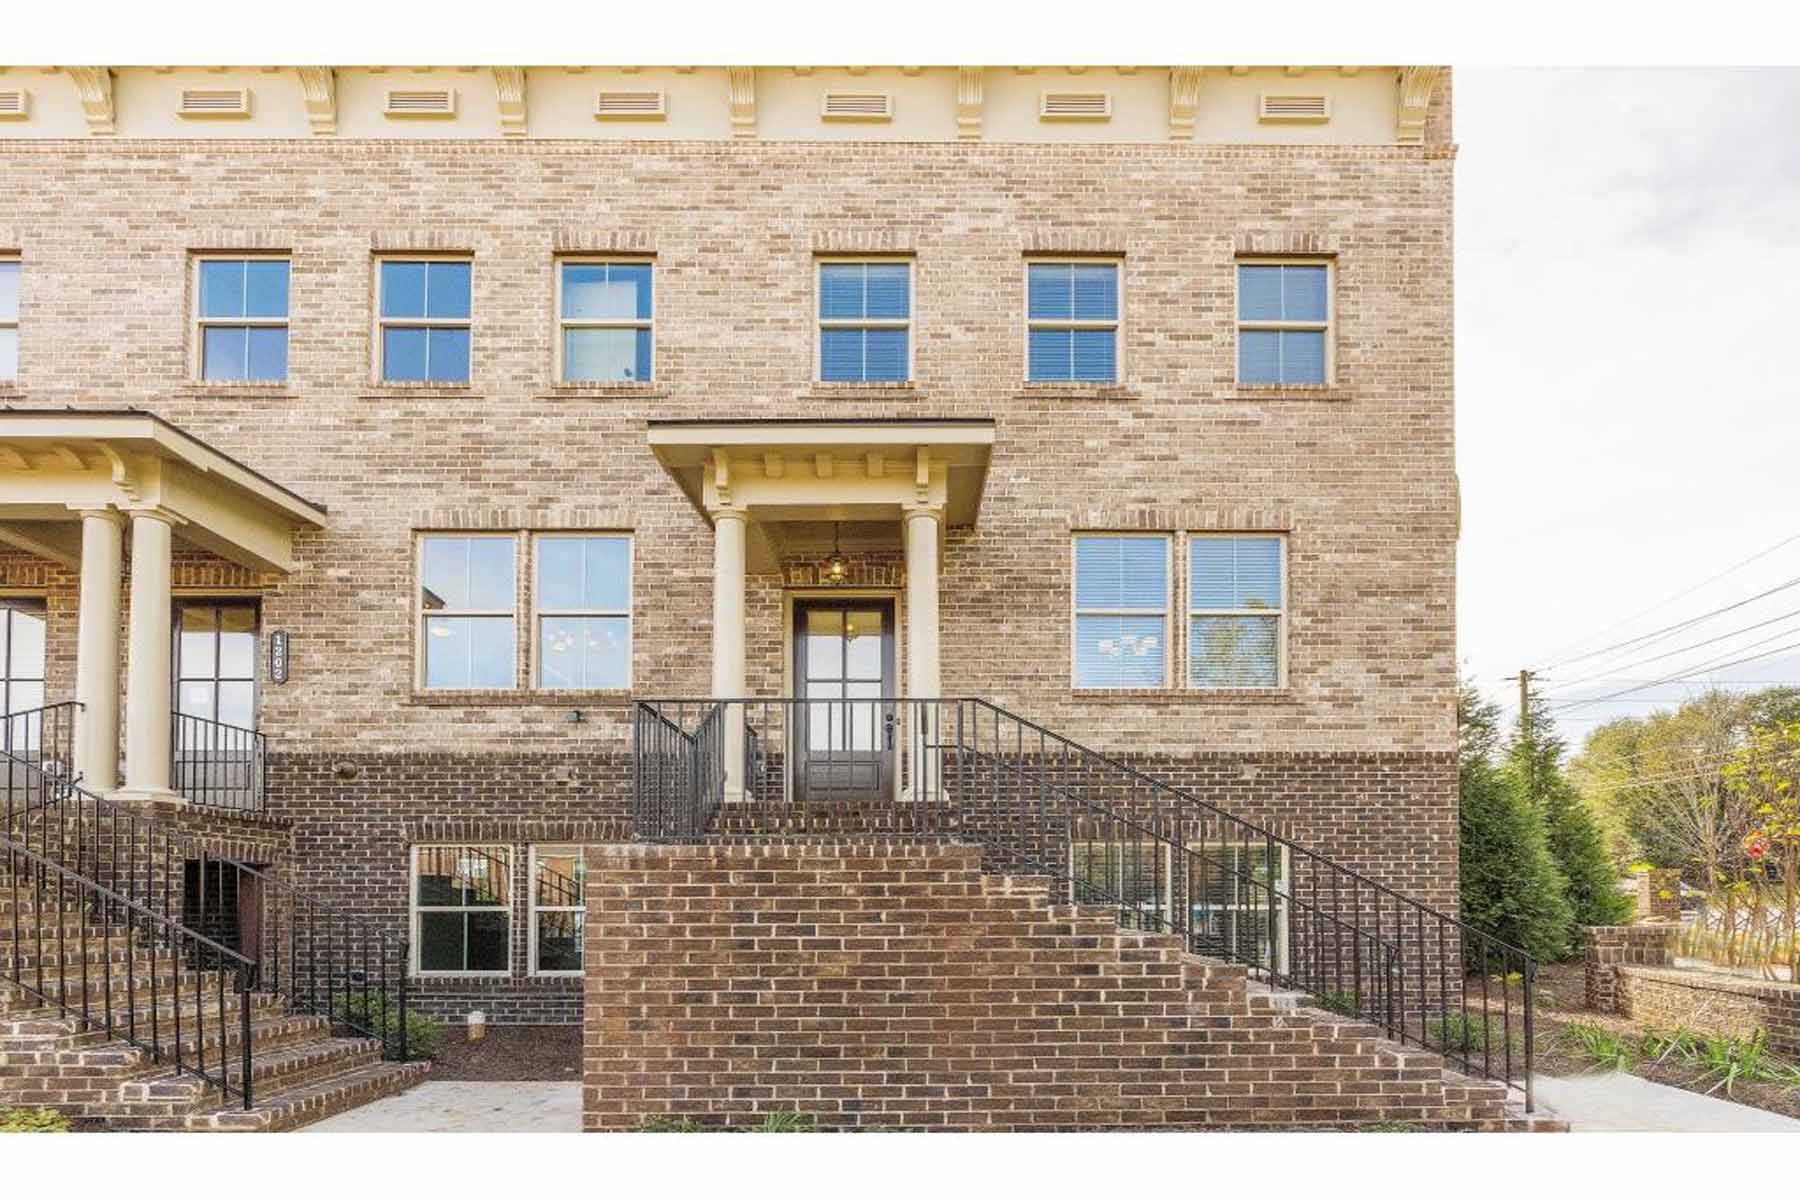 獨棟家庭住宅 為 出售 在 Brand New Townhomes near Emory 891 Briarcliff Road NE Unit 313 Atlanta, 喬治亞州, 30306 美國